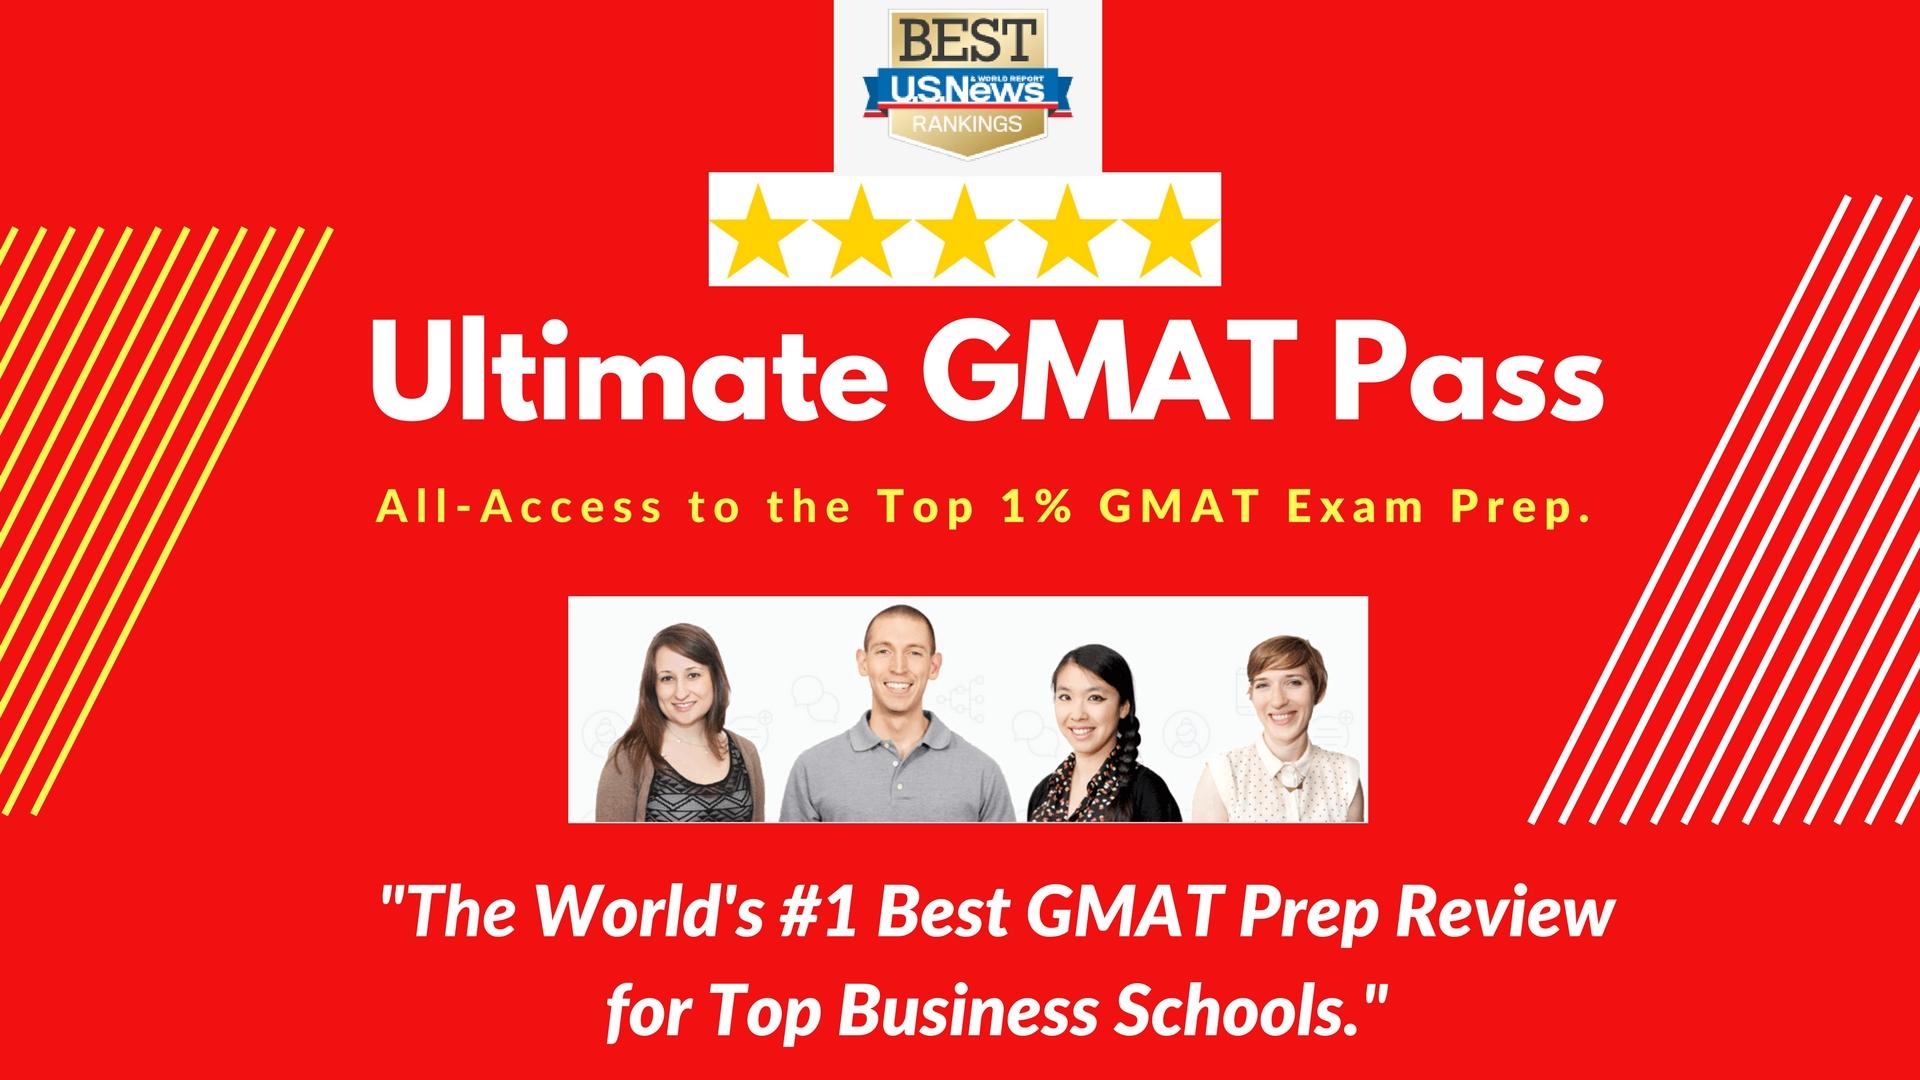 """The Best GMAT Prep"""